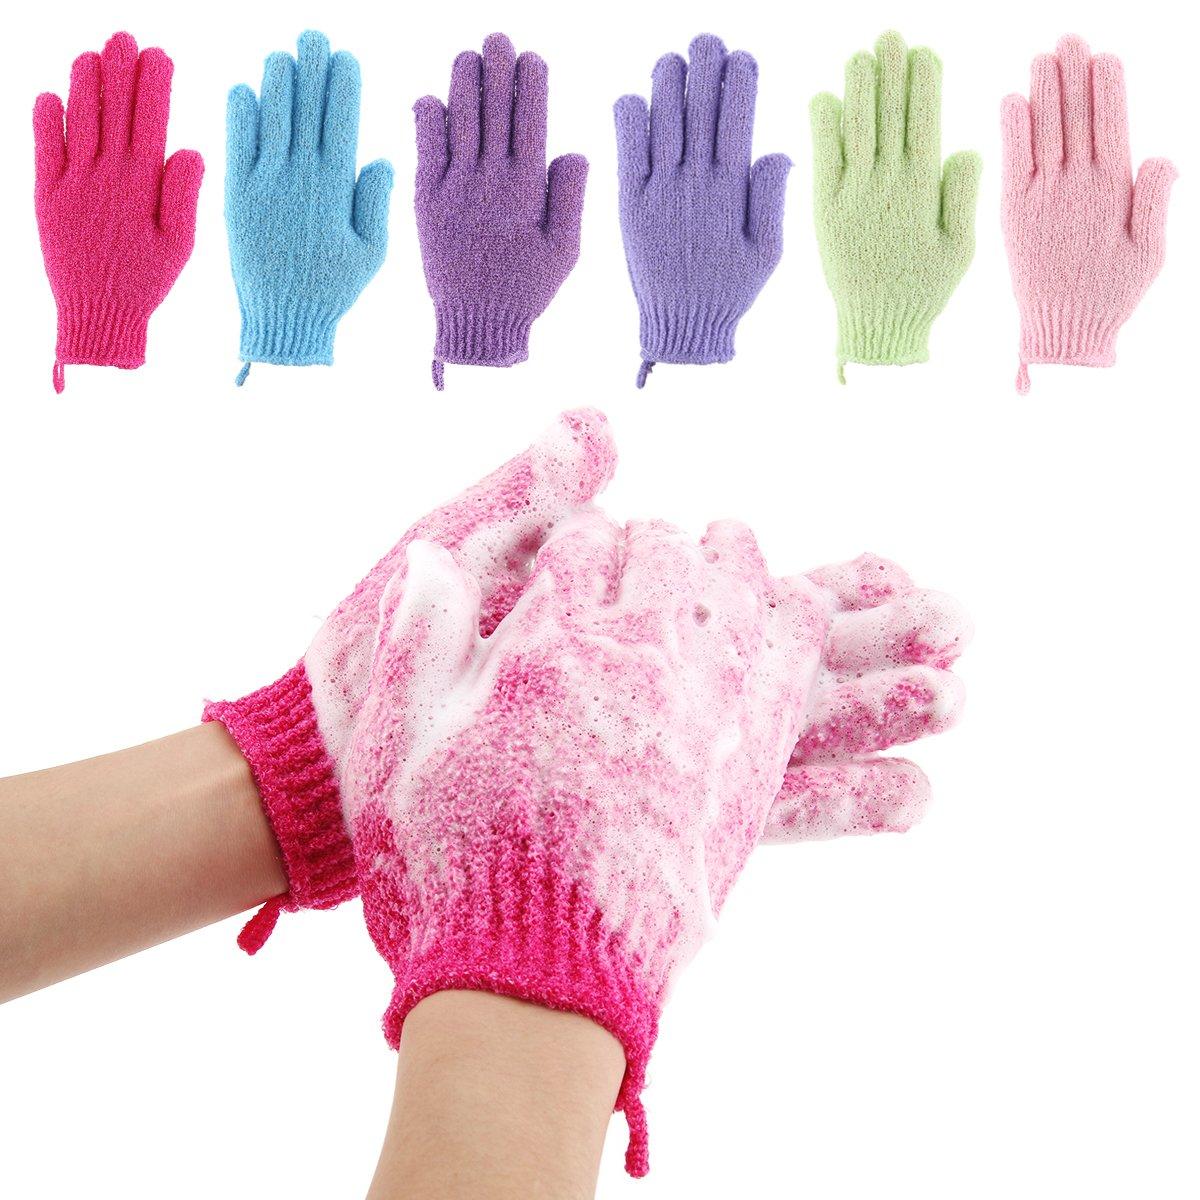 Driving gloves edmonton - Mens Exfoliating Gloves Codream 6 Pair Bath Exfoliating Gloves Nylon Shower Gloves Bath Scrubber Body